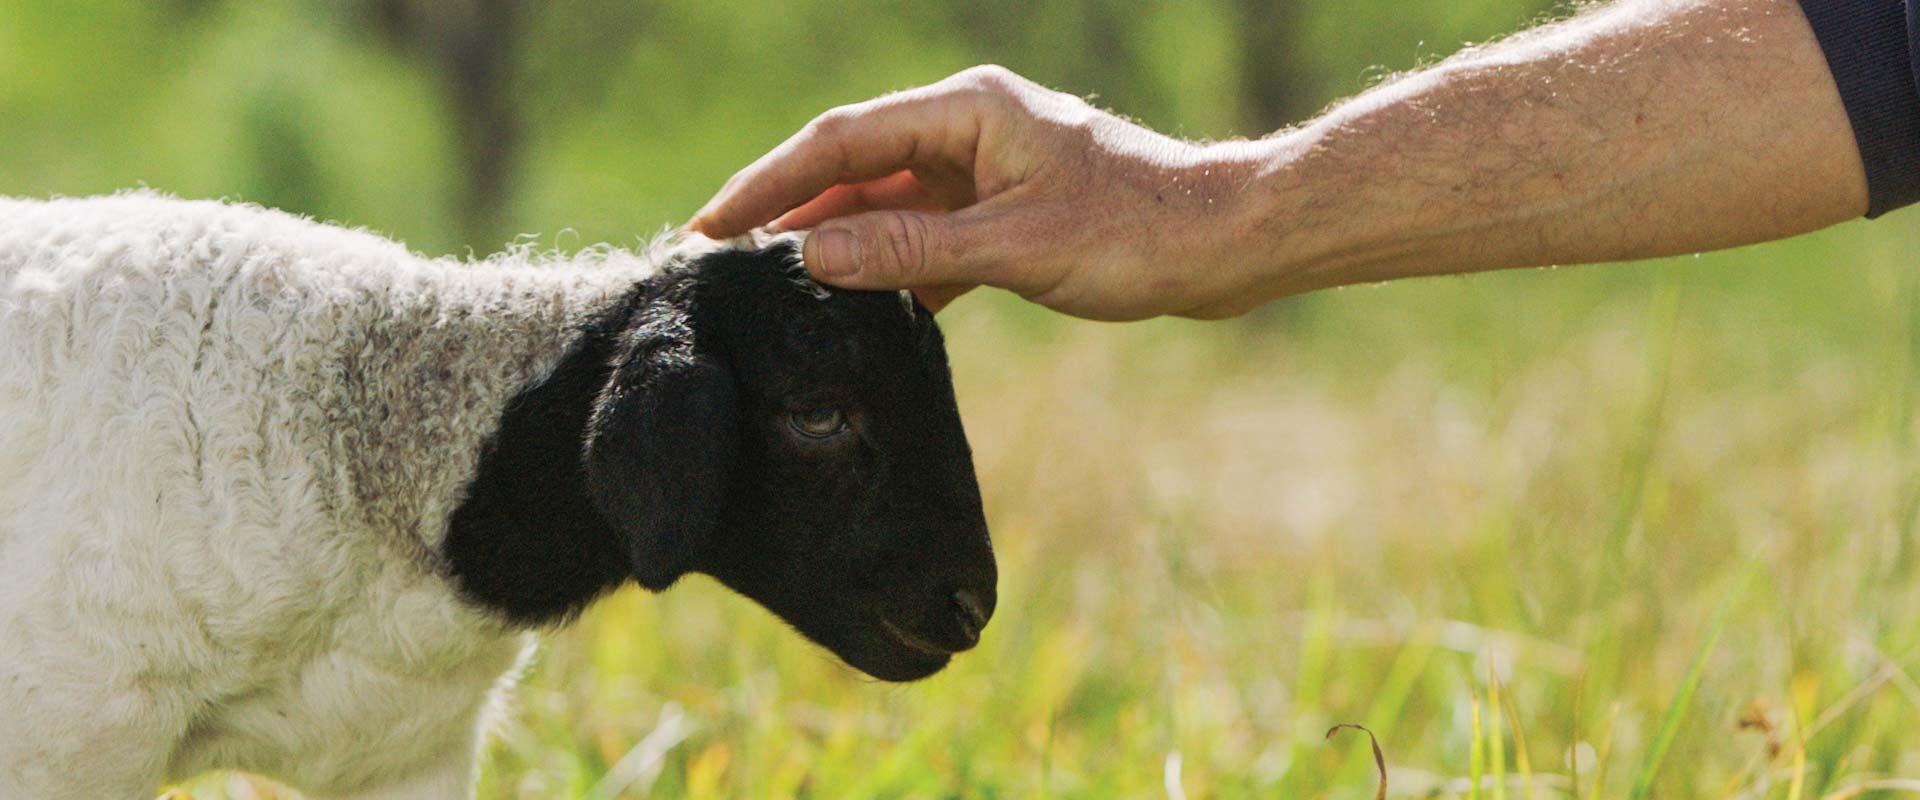 hand petting a lamb